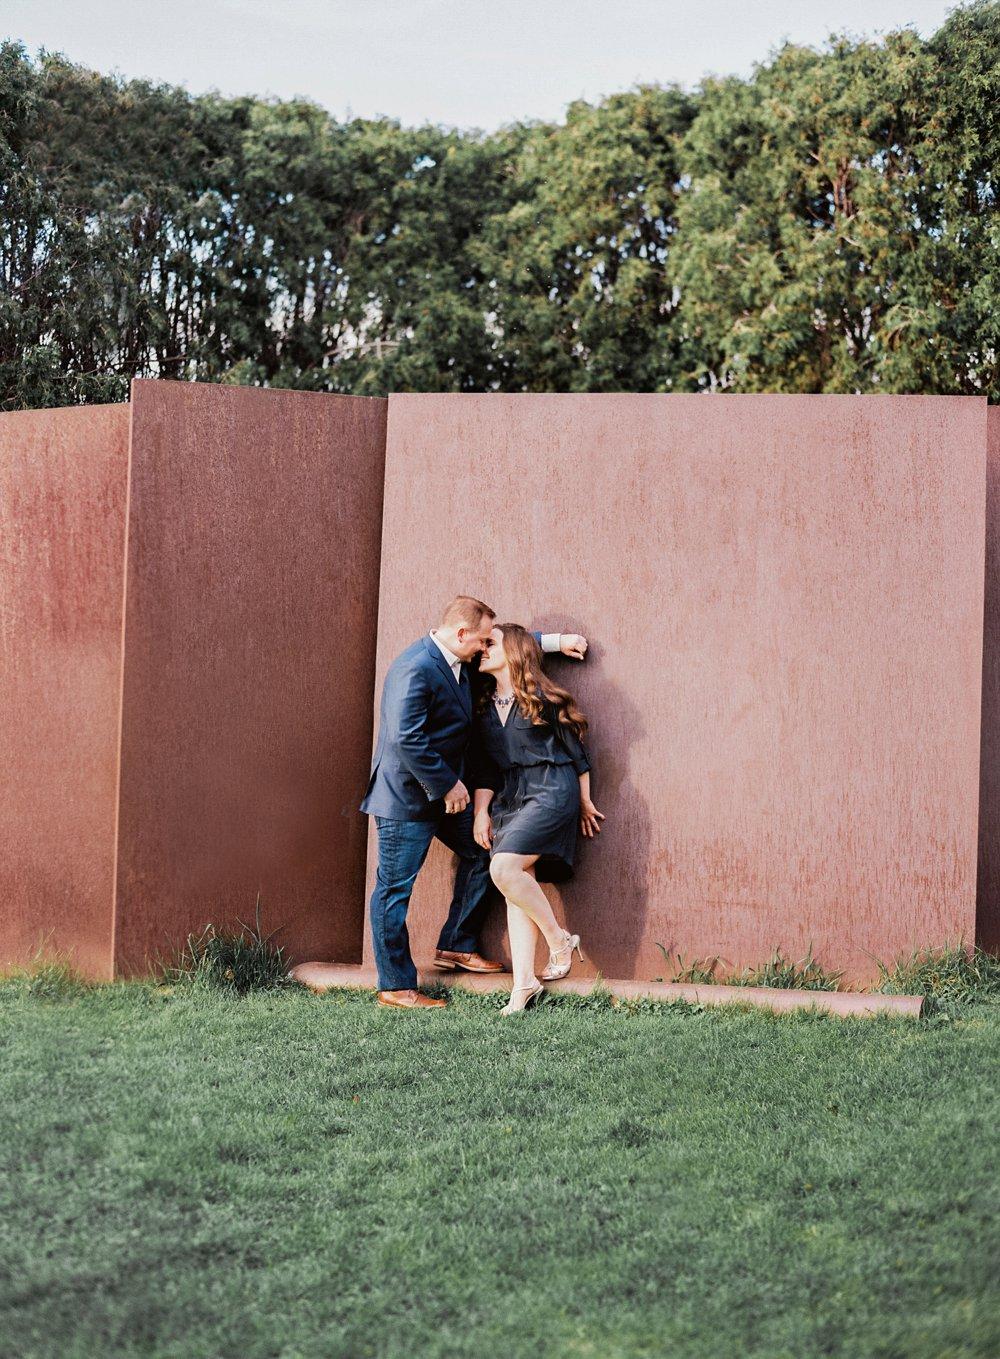 Loring Park wedding photographer